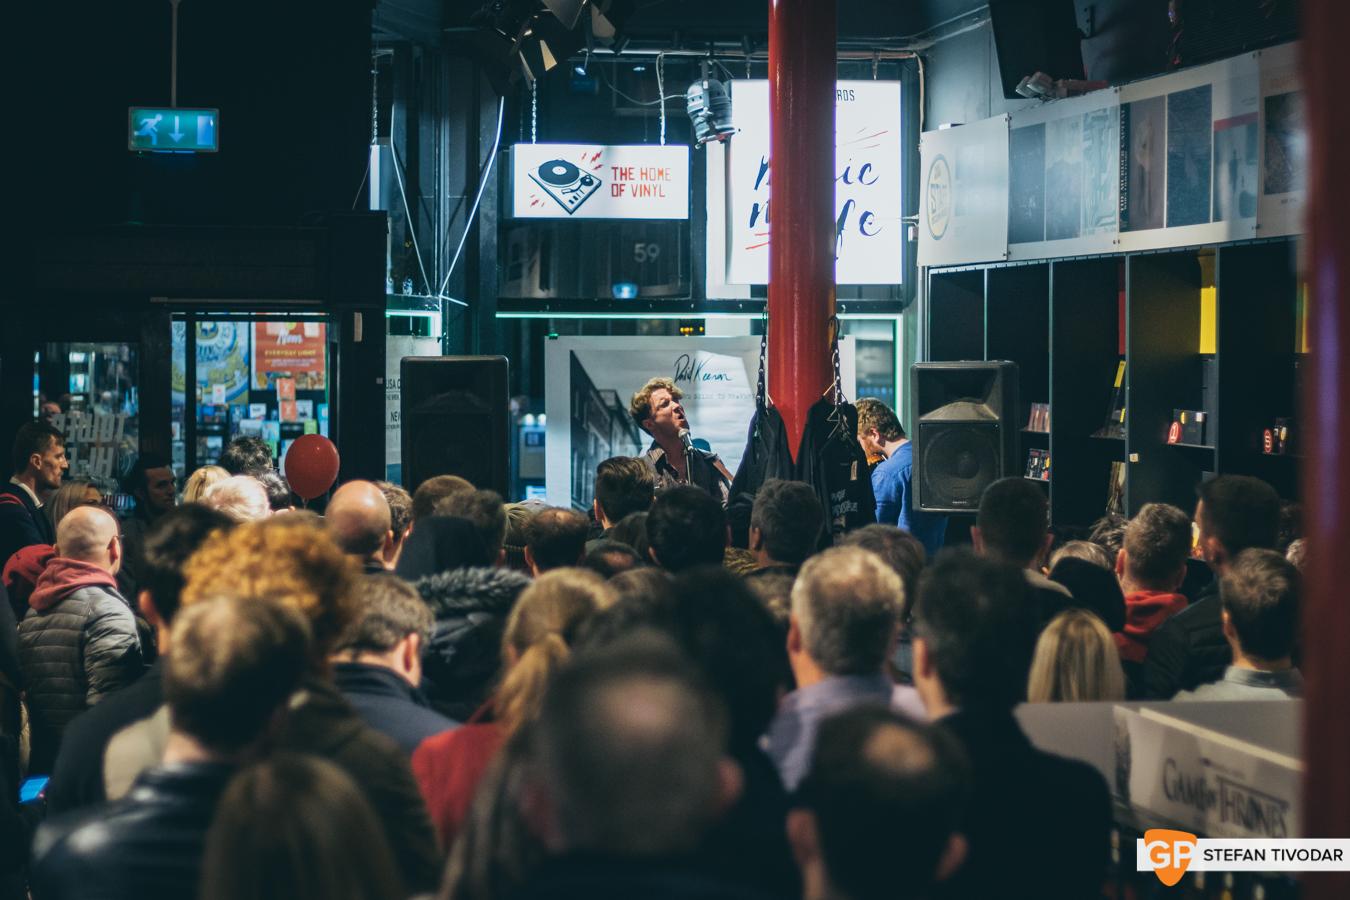 David Keenan Album Launch Tower Records Dublin 2020 Tivodar 13